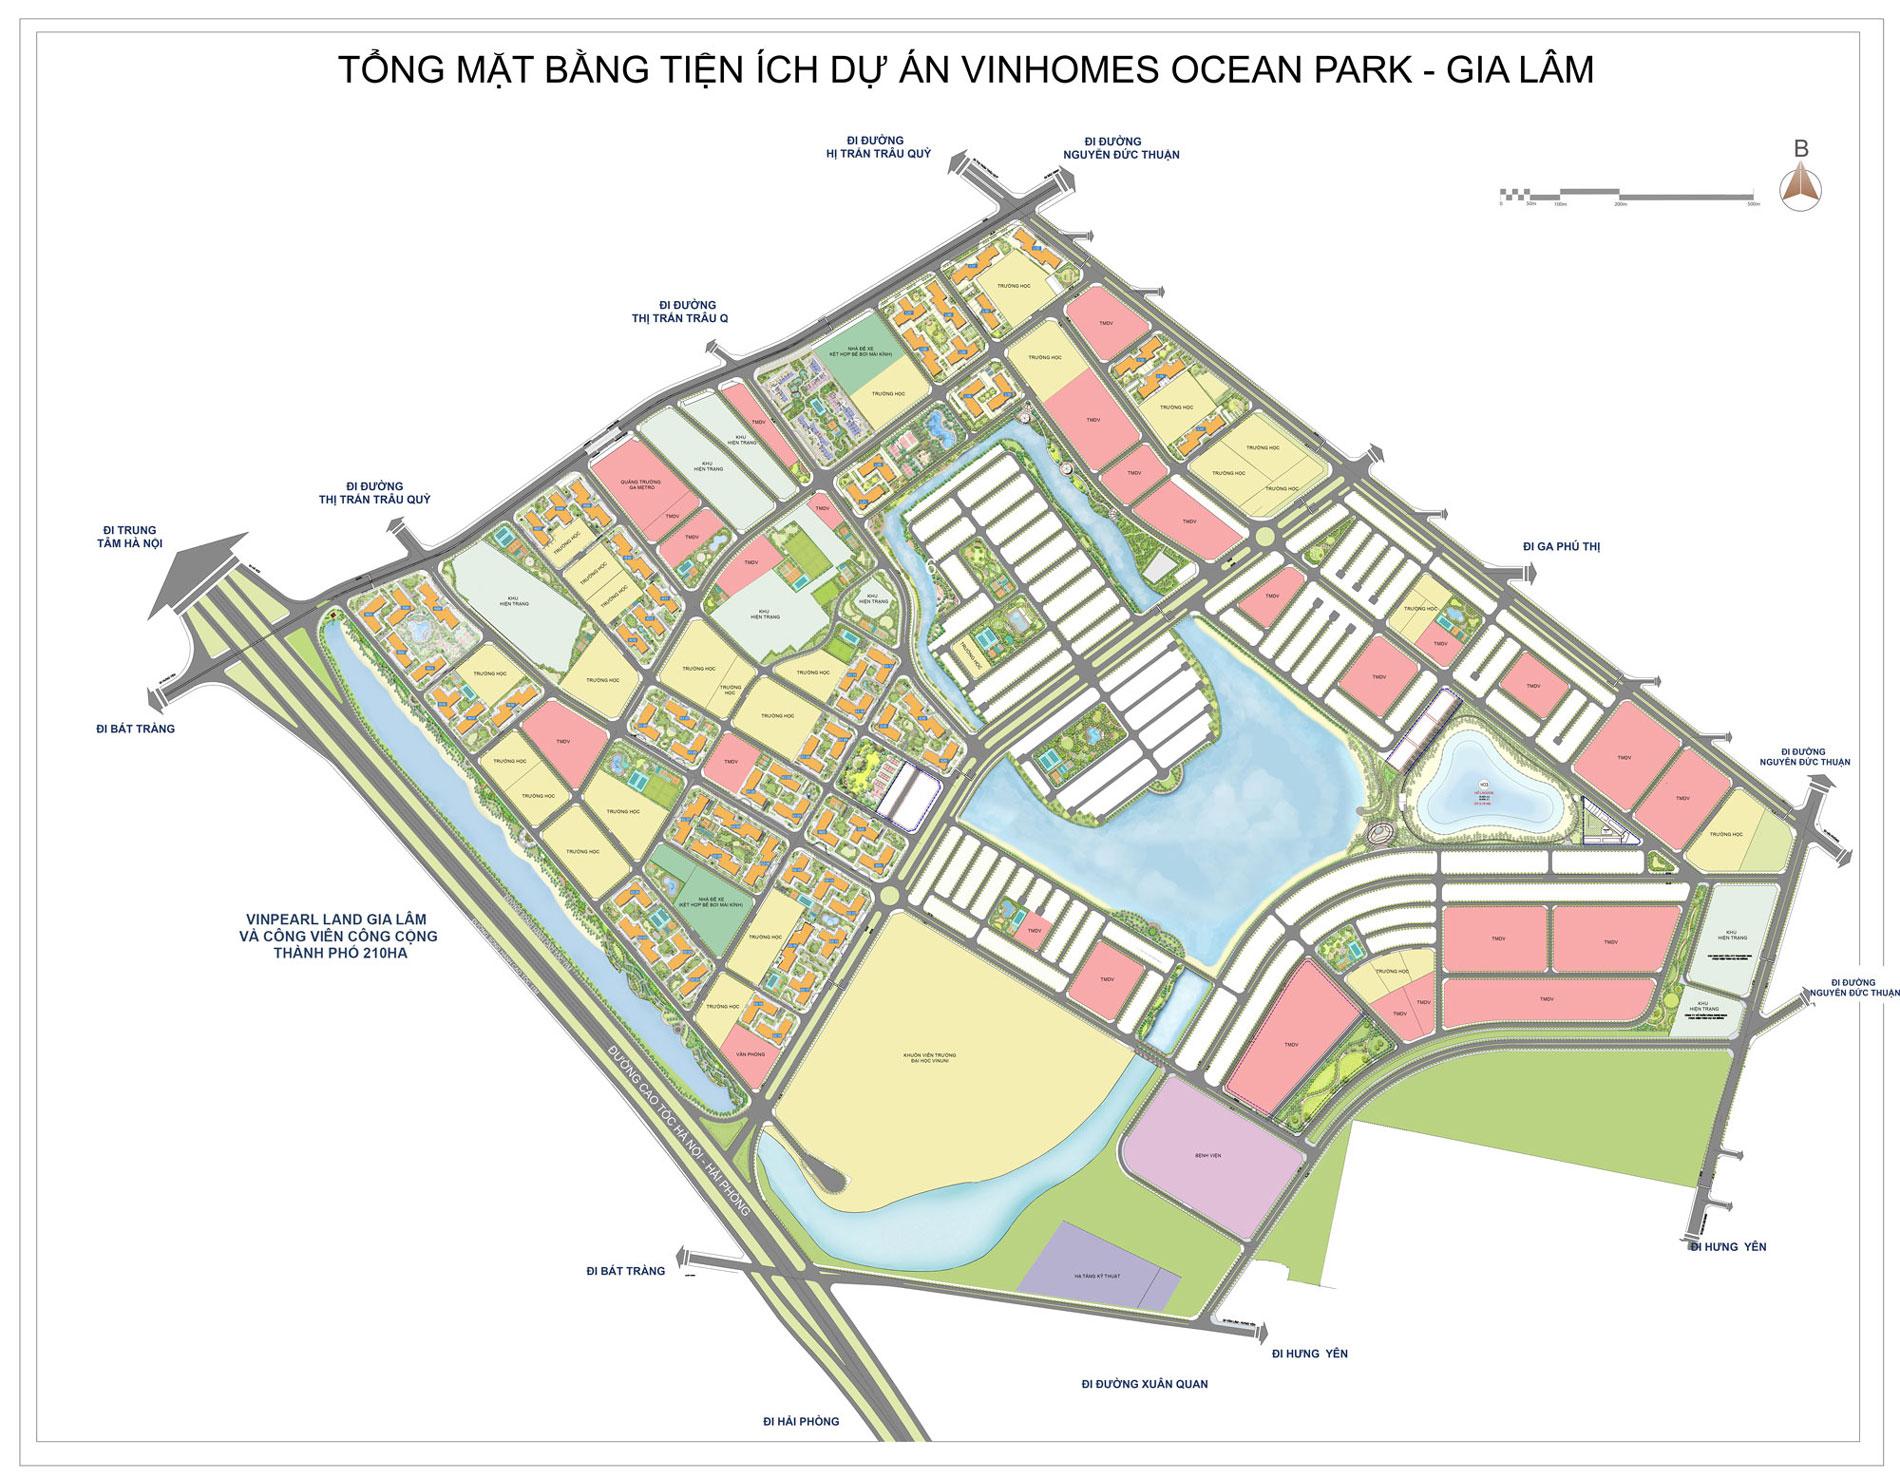 hinh anh tong quan vi tri vinhomes ocean park - thanh pho bien ho trong long Ha Noi so 1